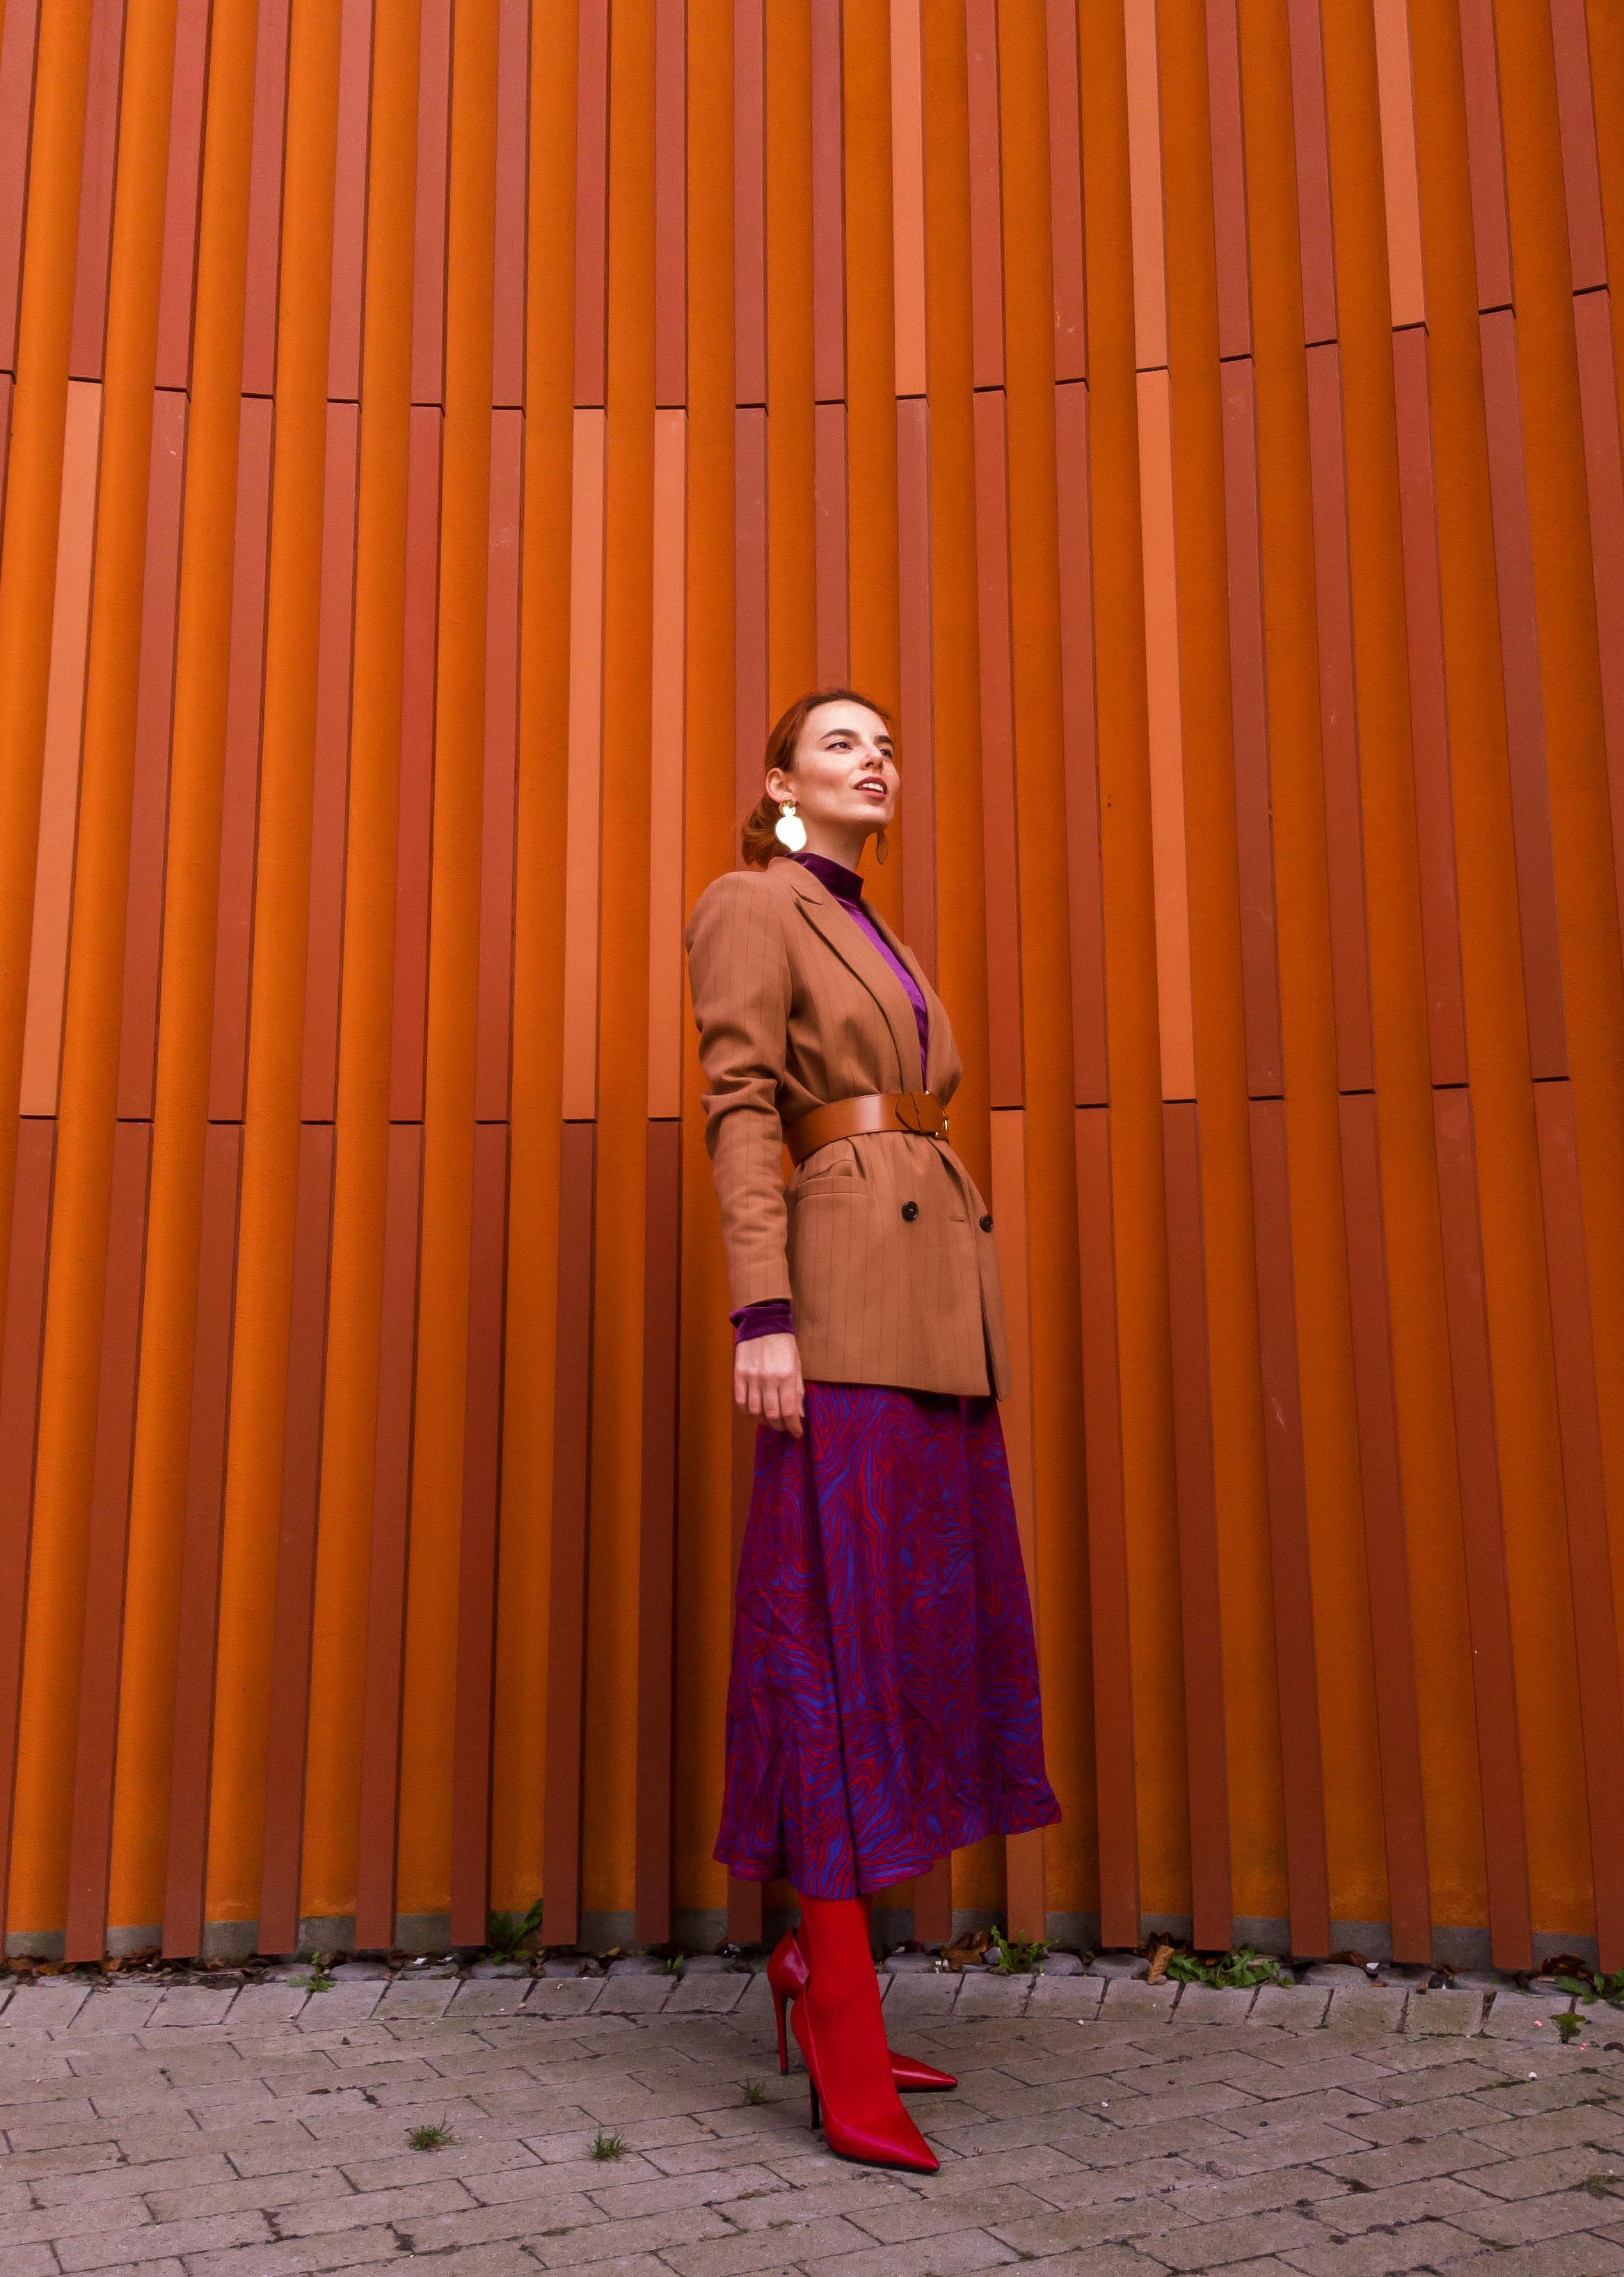 Ganni blazer // & Other Stories skirt and belt // Prada shoes